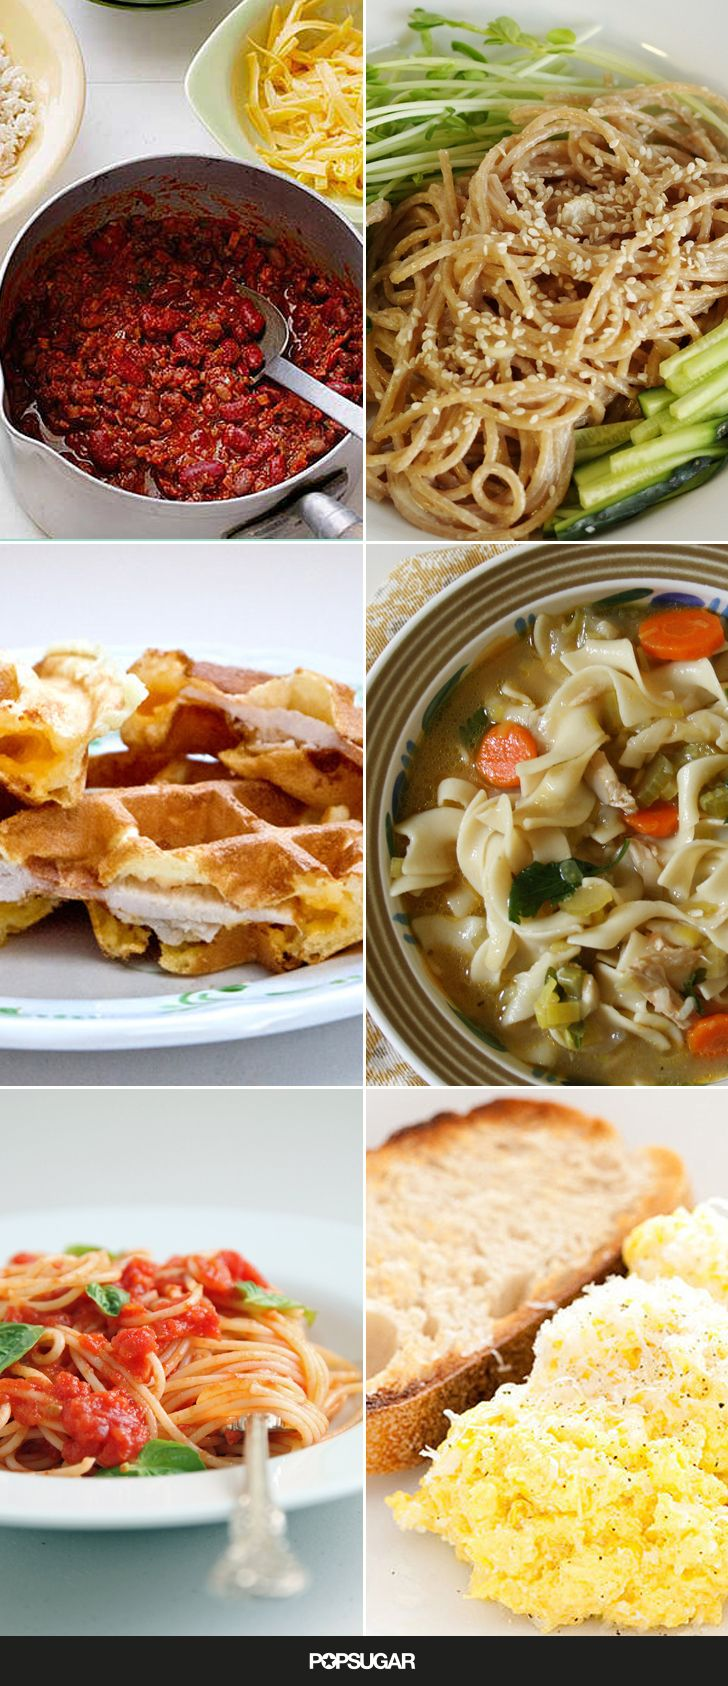 66 best Pantries images on Pinterest   Kitchen ideas, Pantry ideas ...